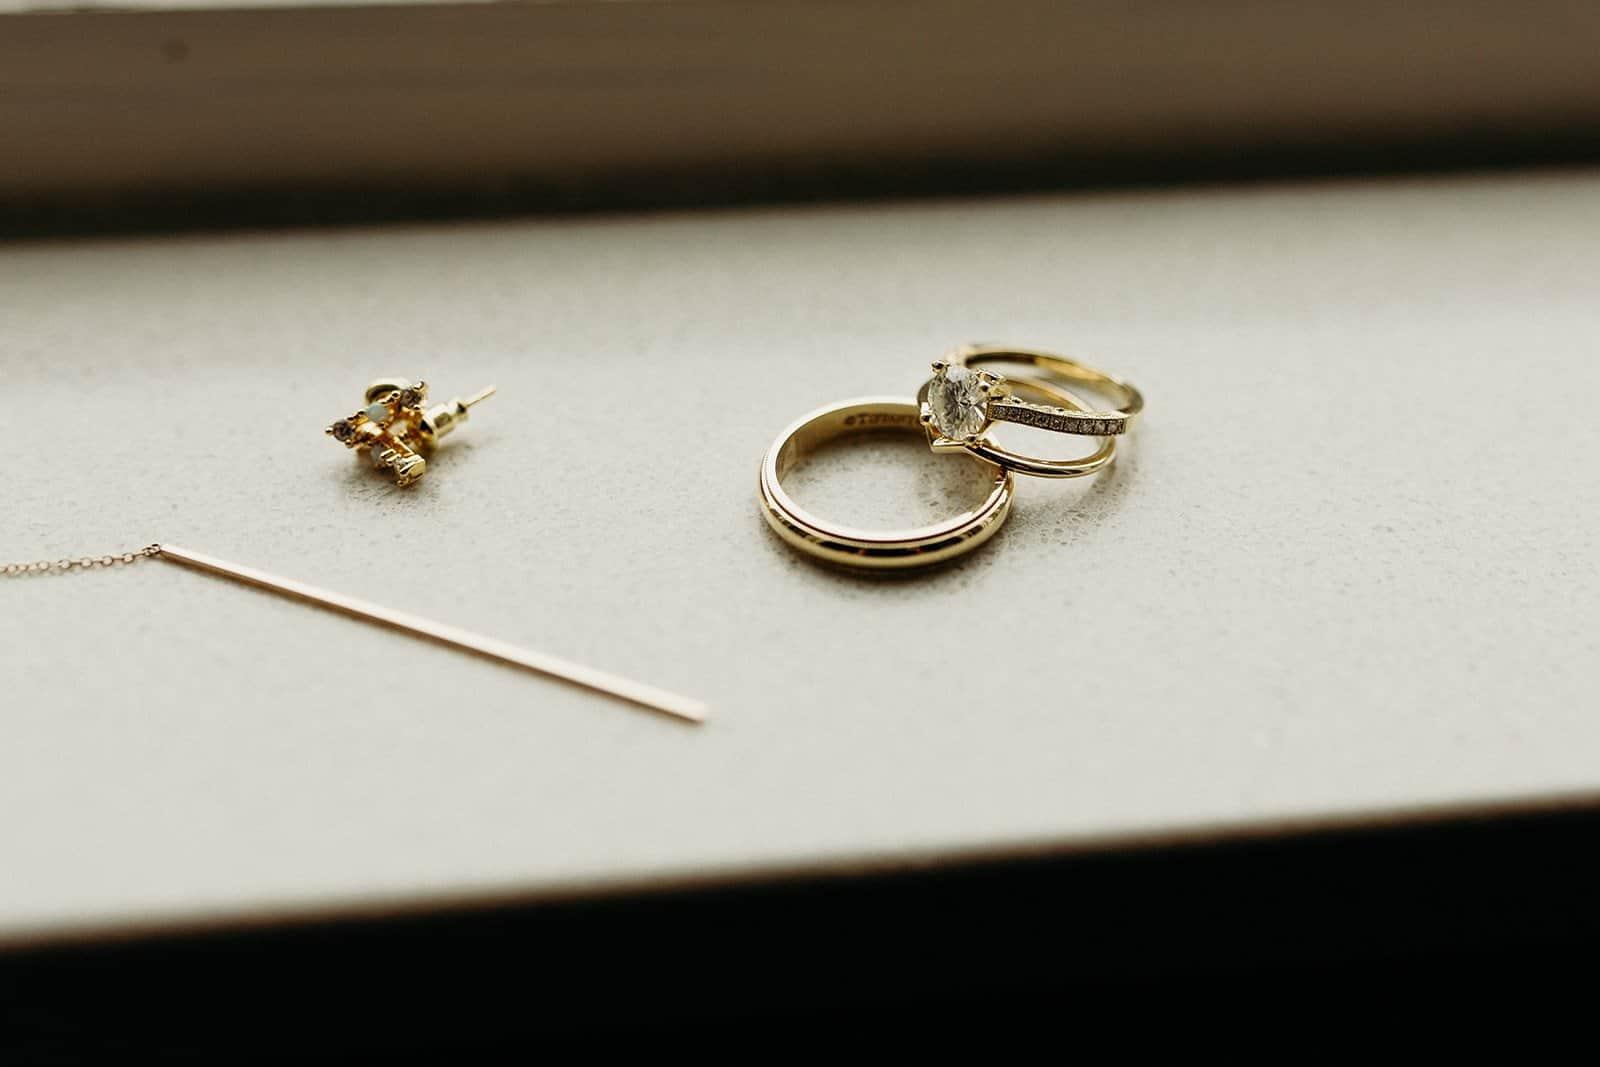 wedding rings and earrings on ledge